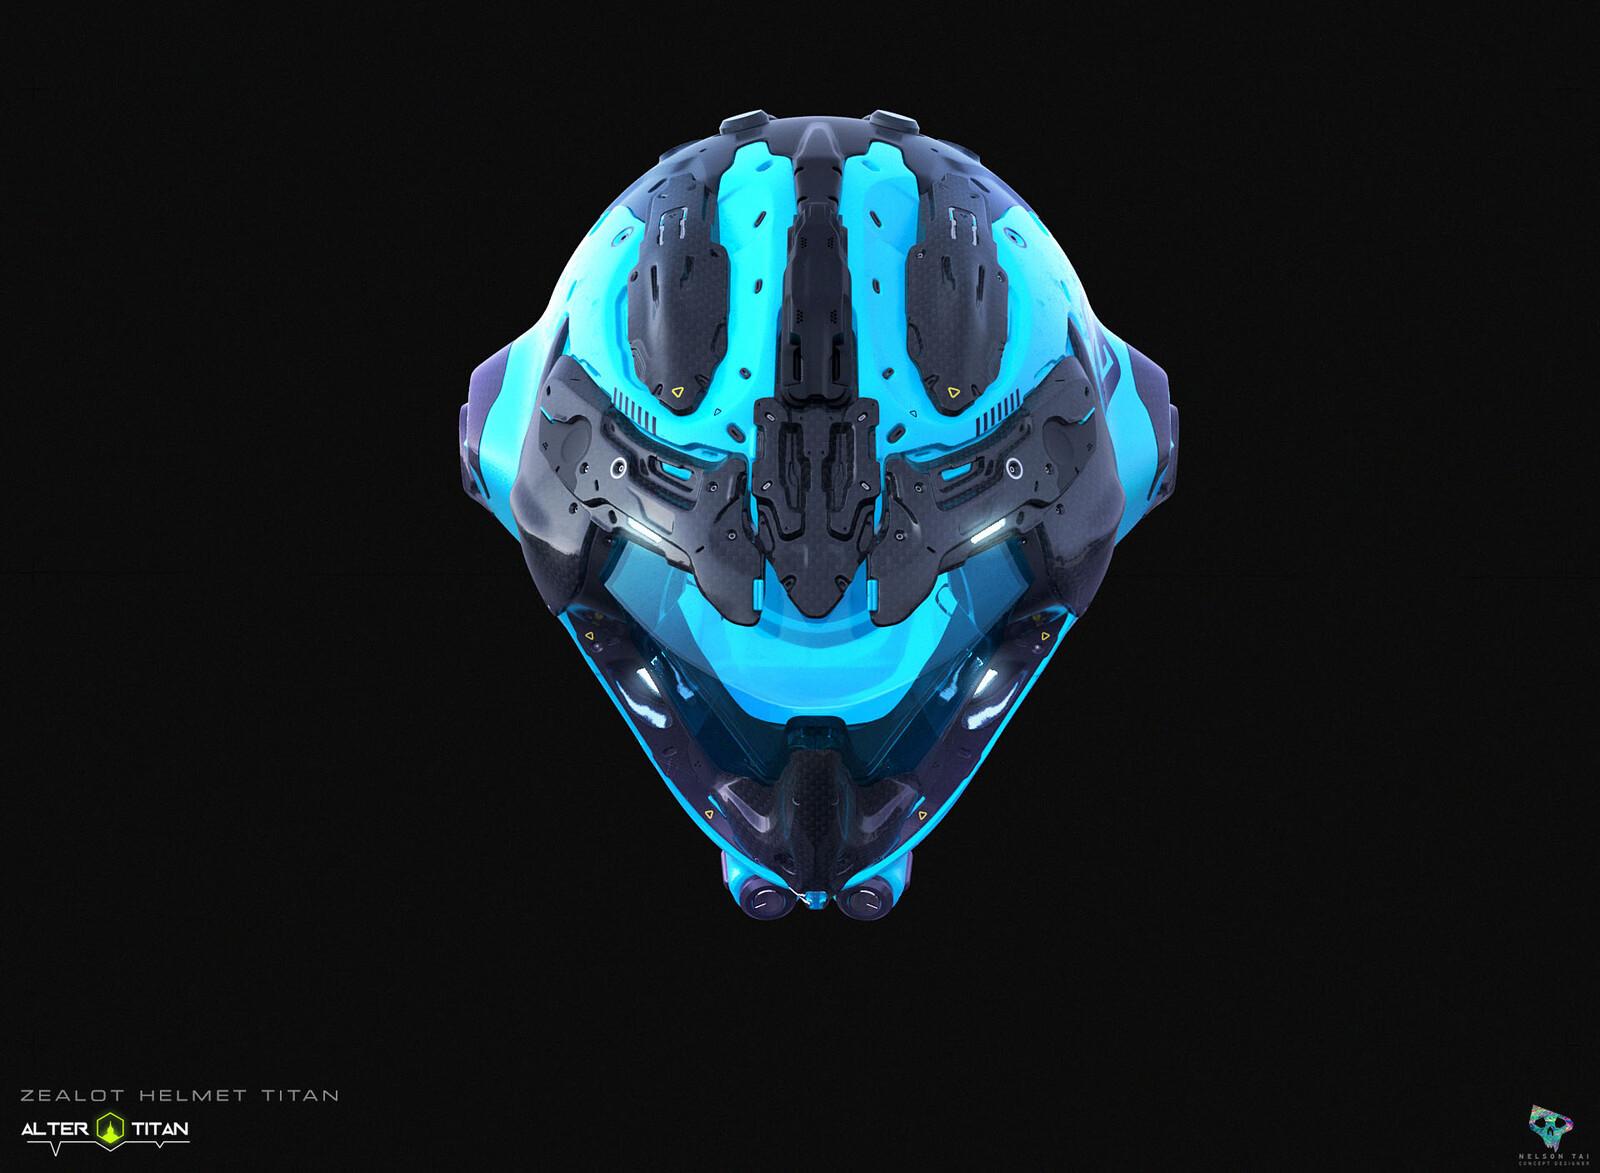 The sexy front view of the Zealolt Helmet